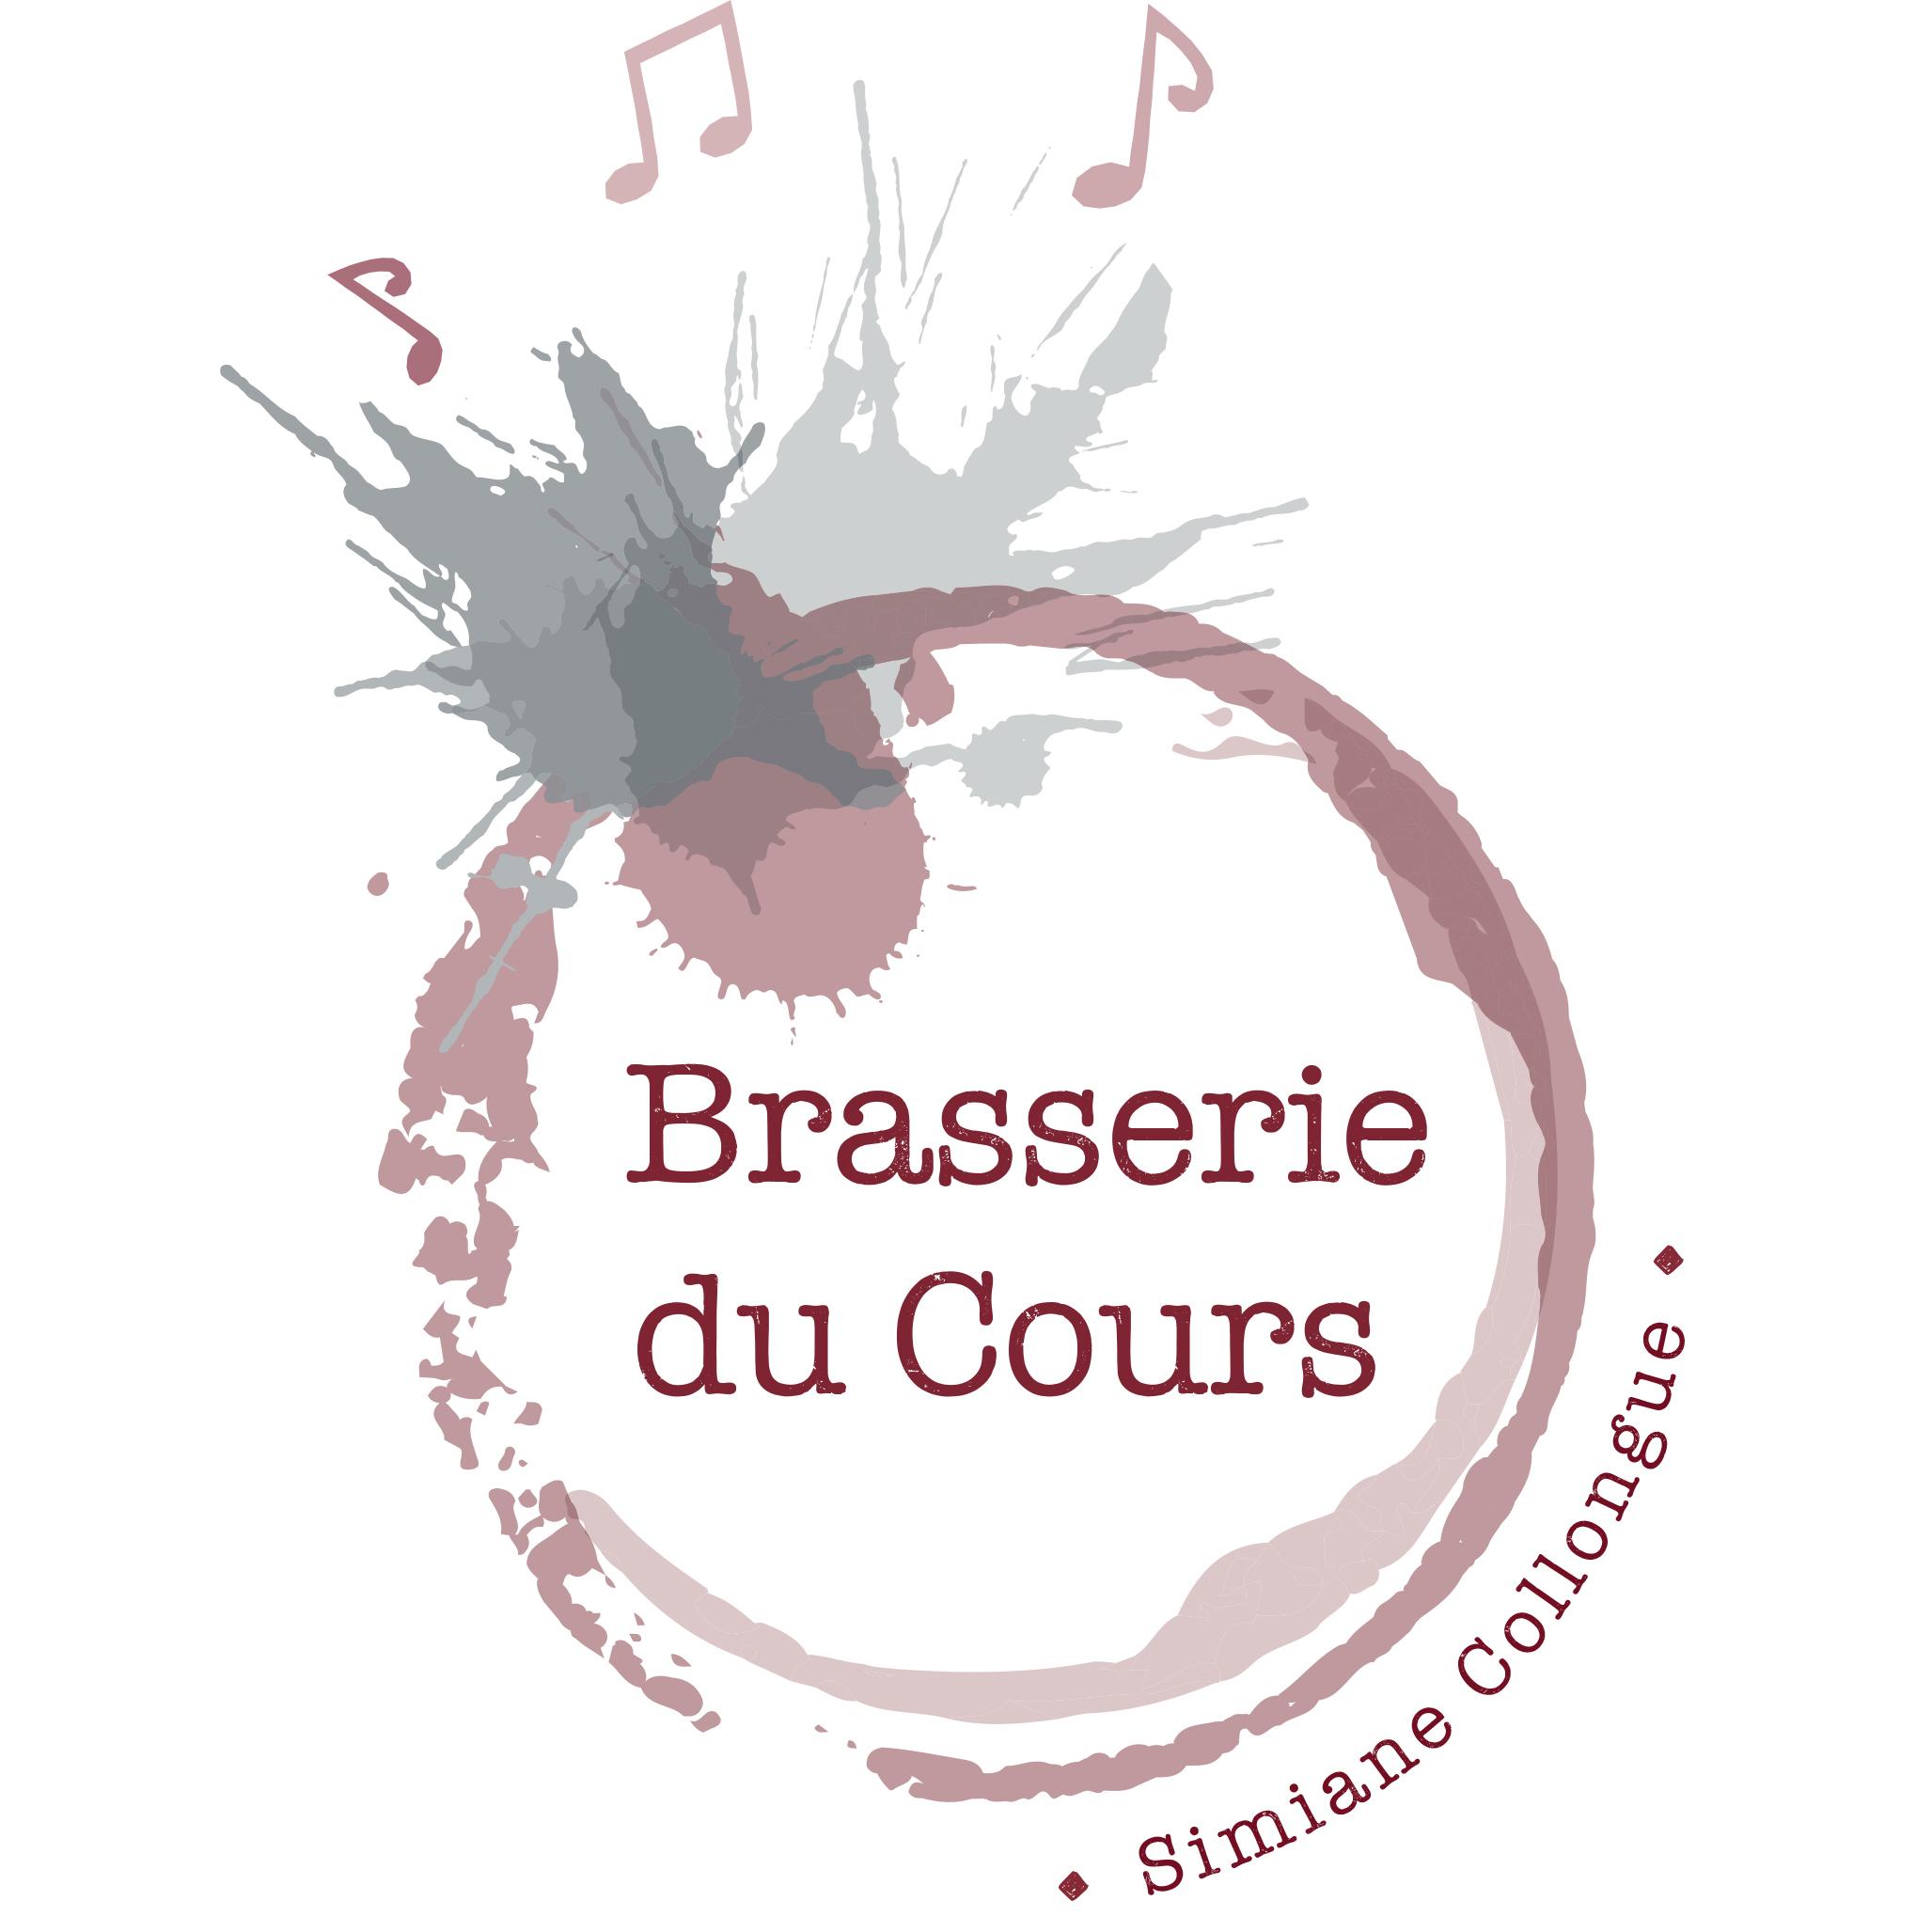 Brasserie Simiane Mimet Gardanne Bouc Bel Air